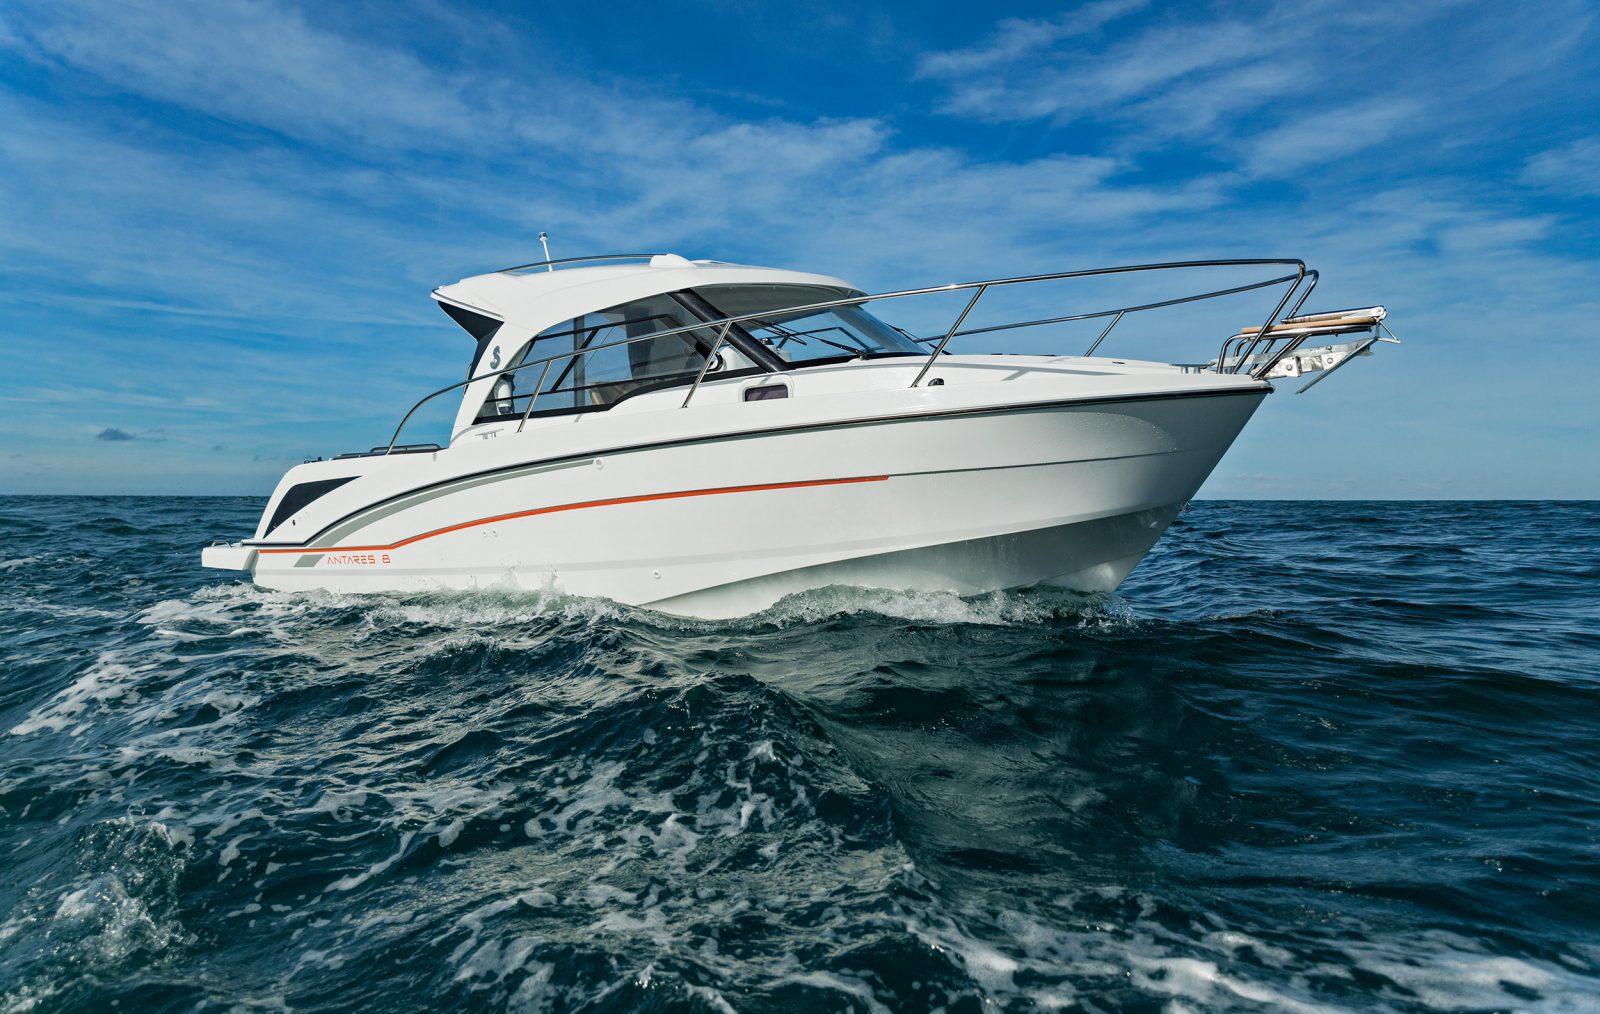 Simpson Marine - Antares Outboard 8